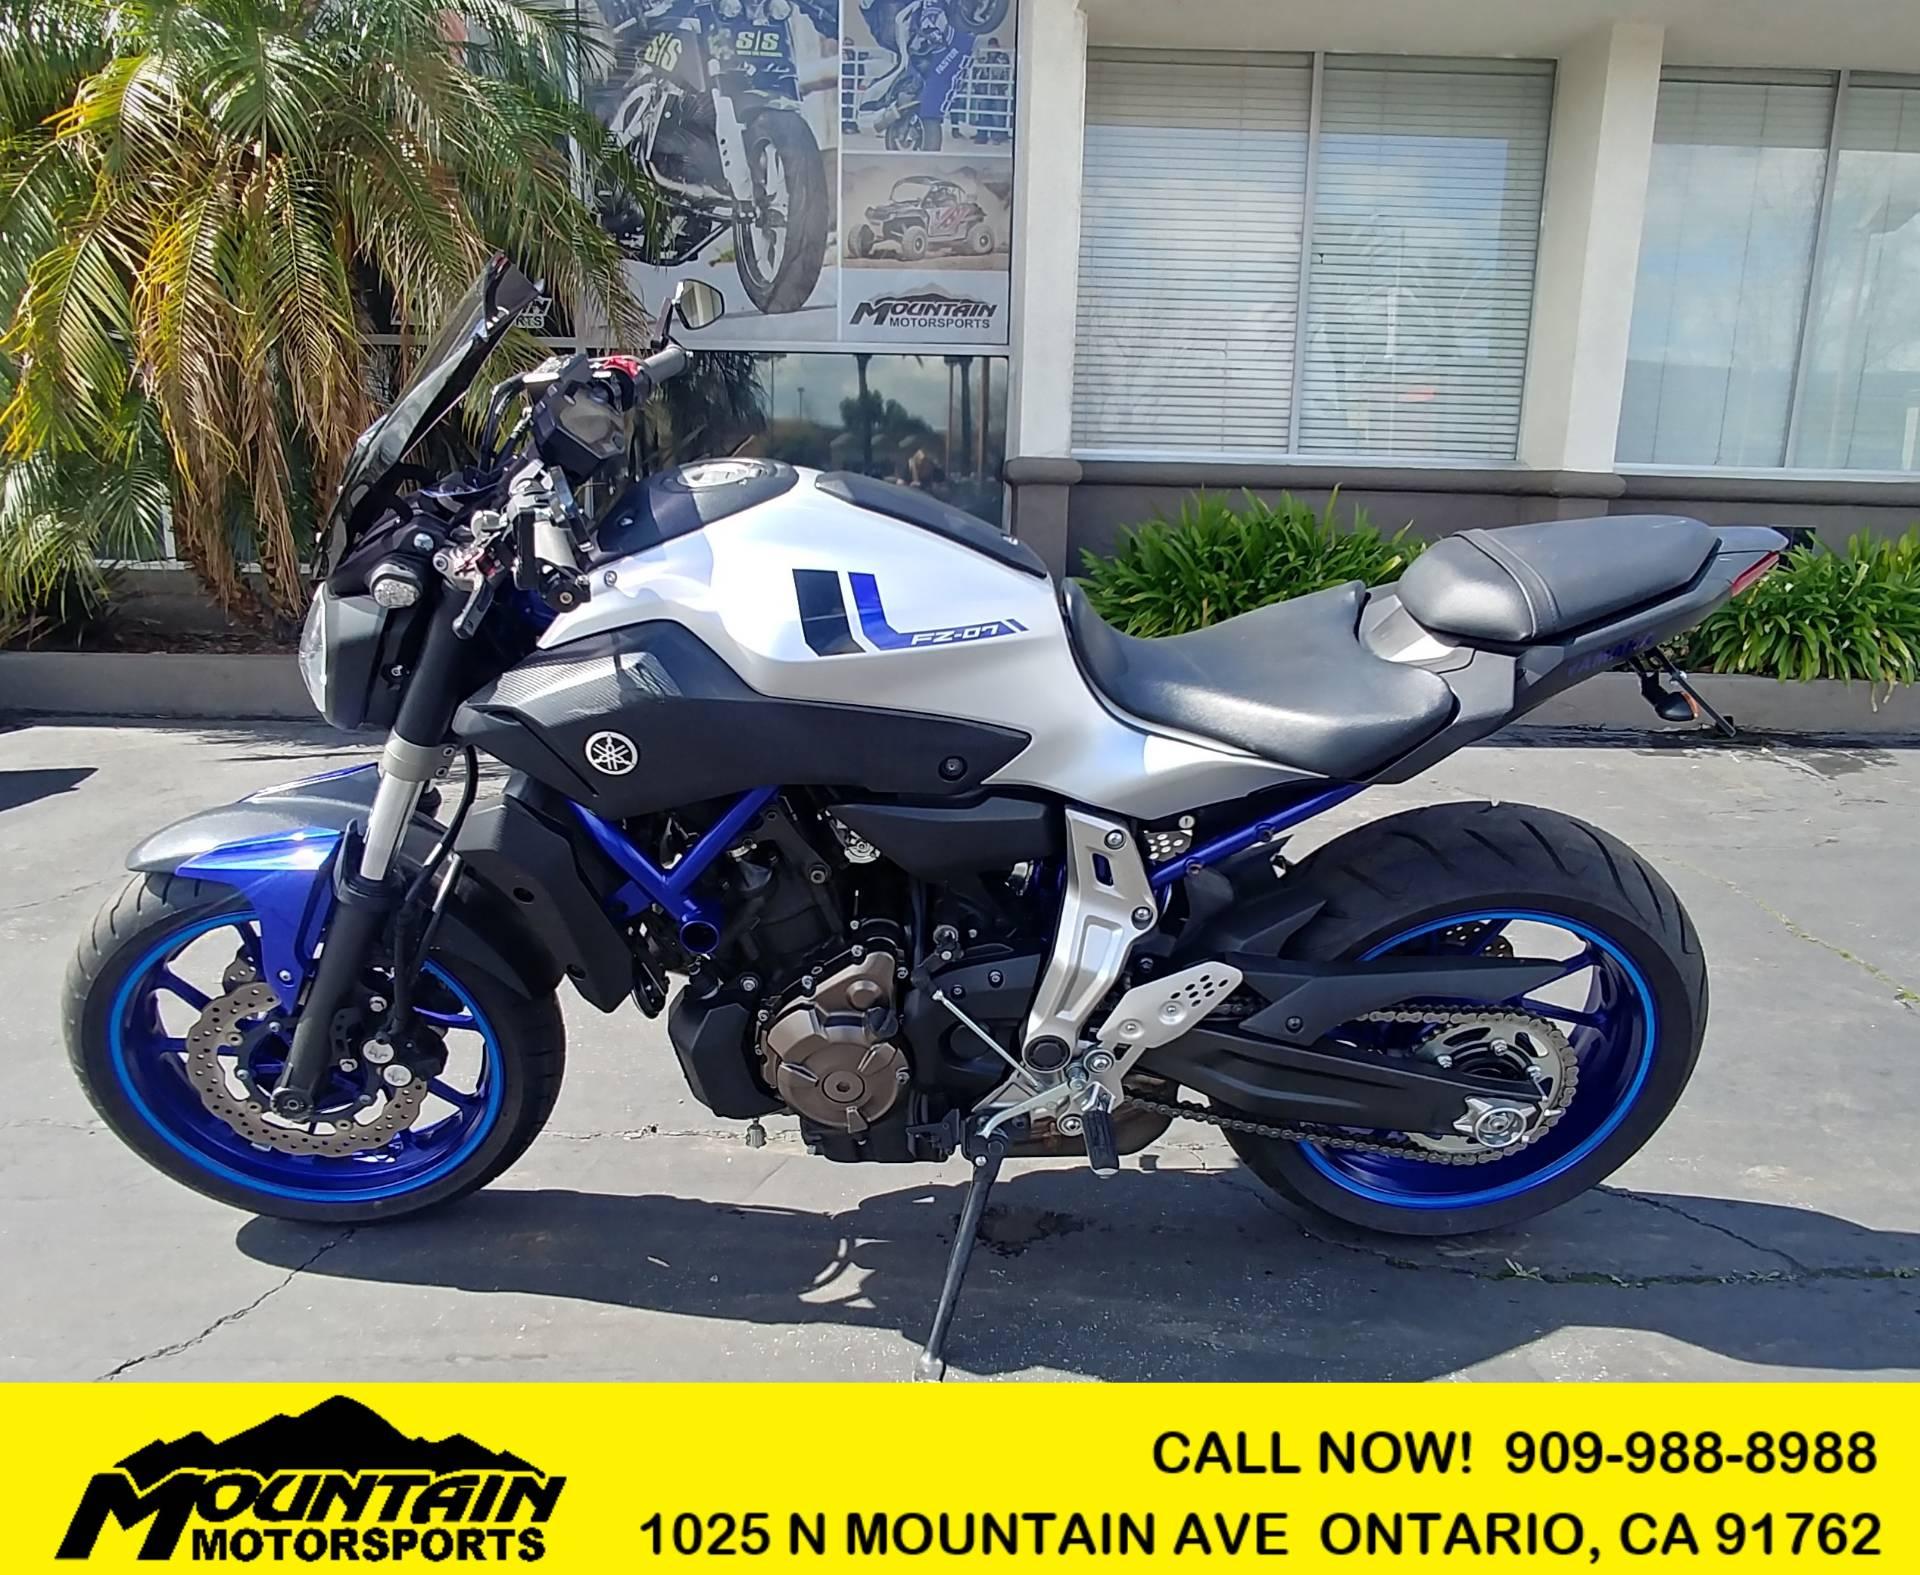 2016 Yamaha FZ-07 for sale 86608